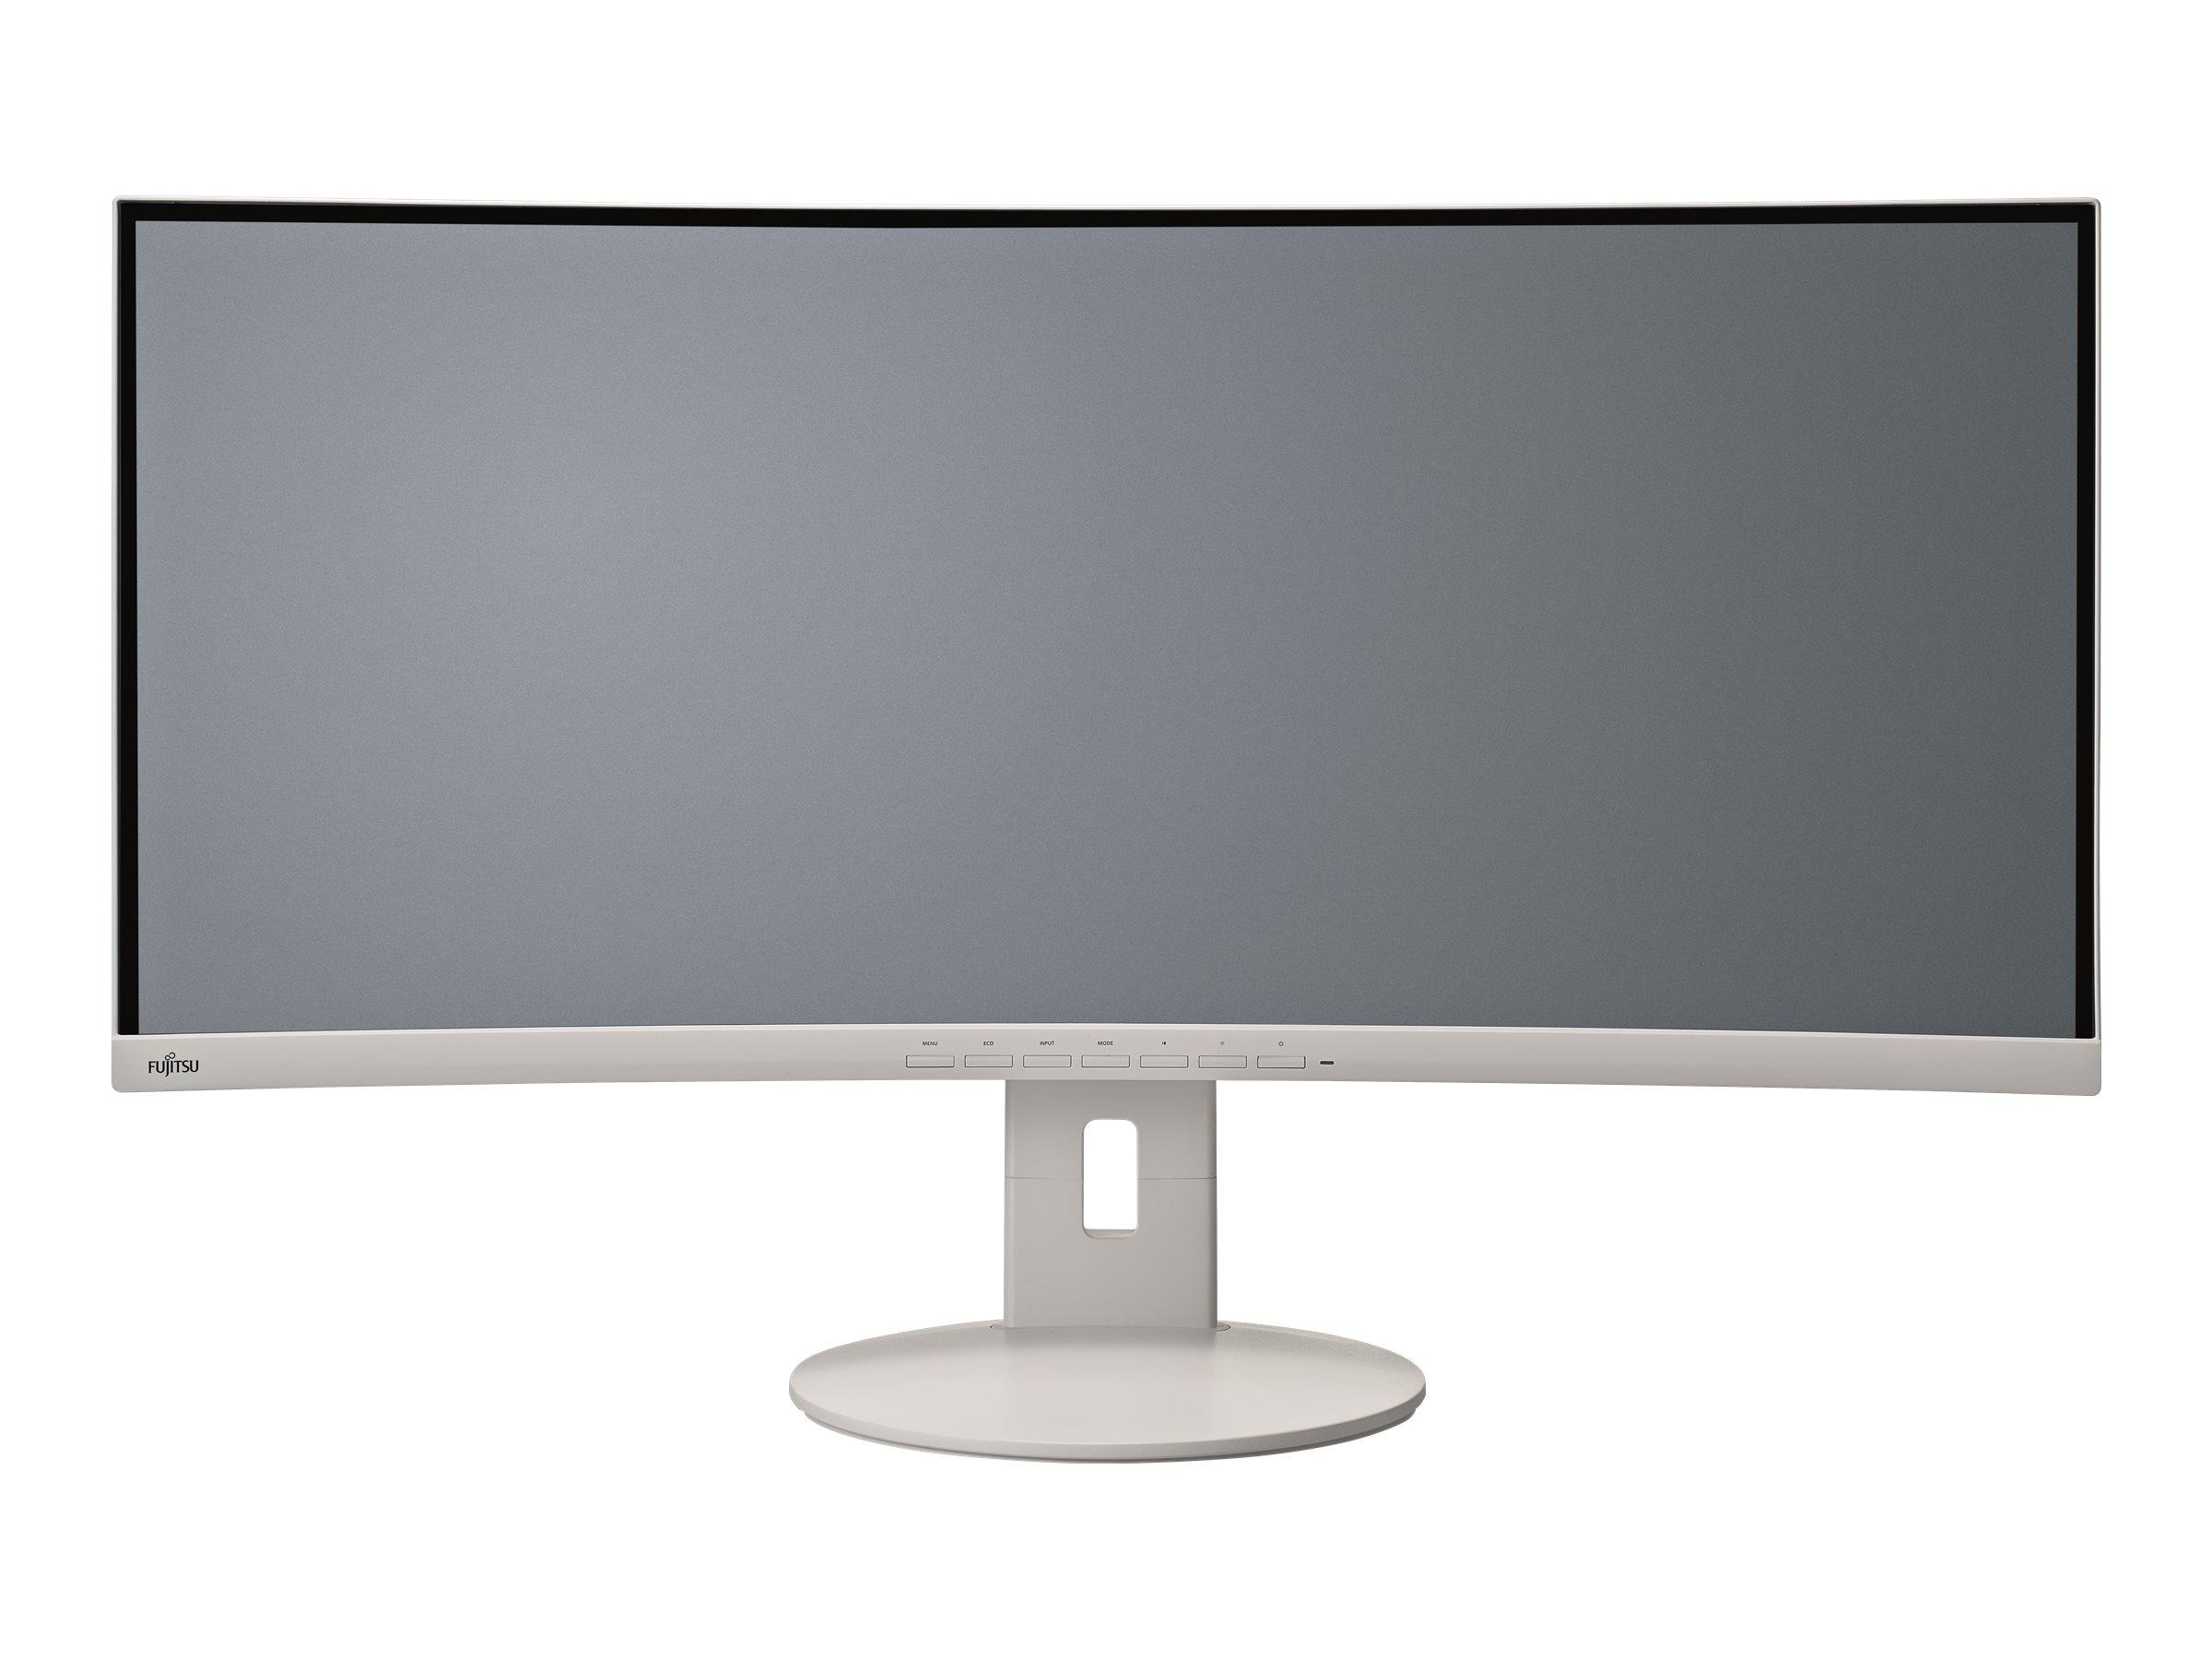 Fujitsu B34-9 UE - LED-Monitor - gebogen - 86.3 cm (34